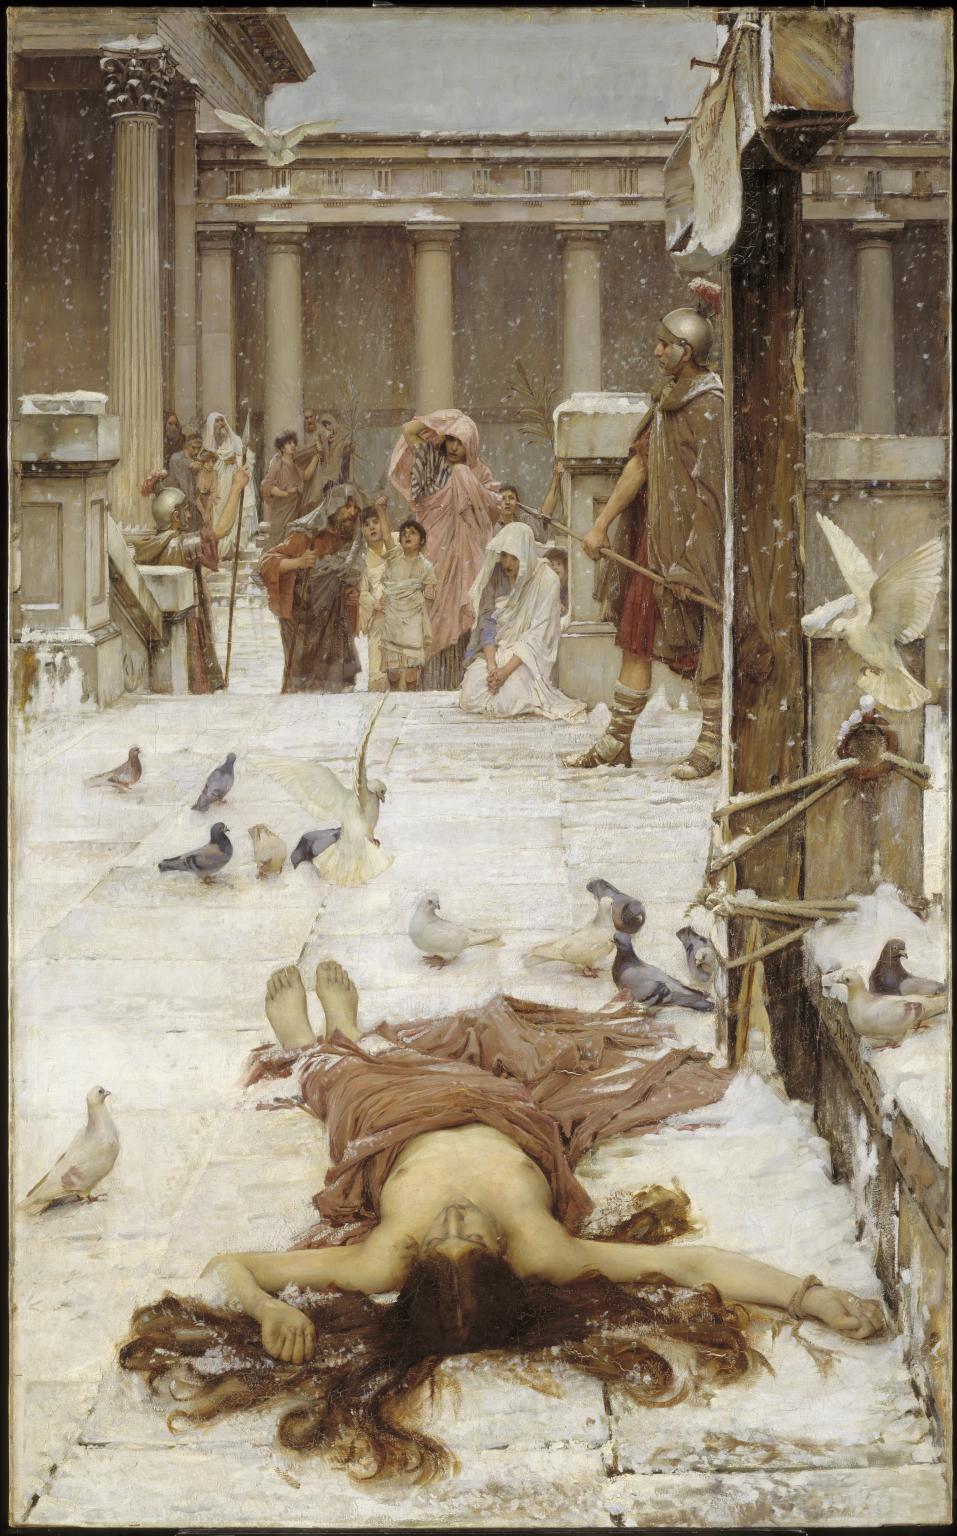 John William Waterhouse. Saint Eulalia